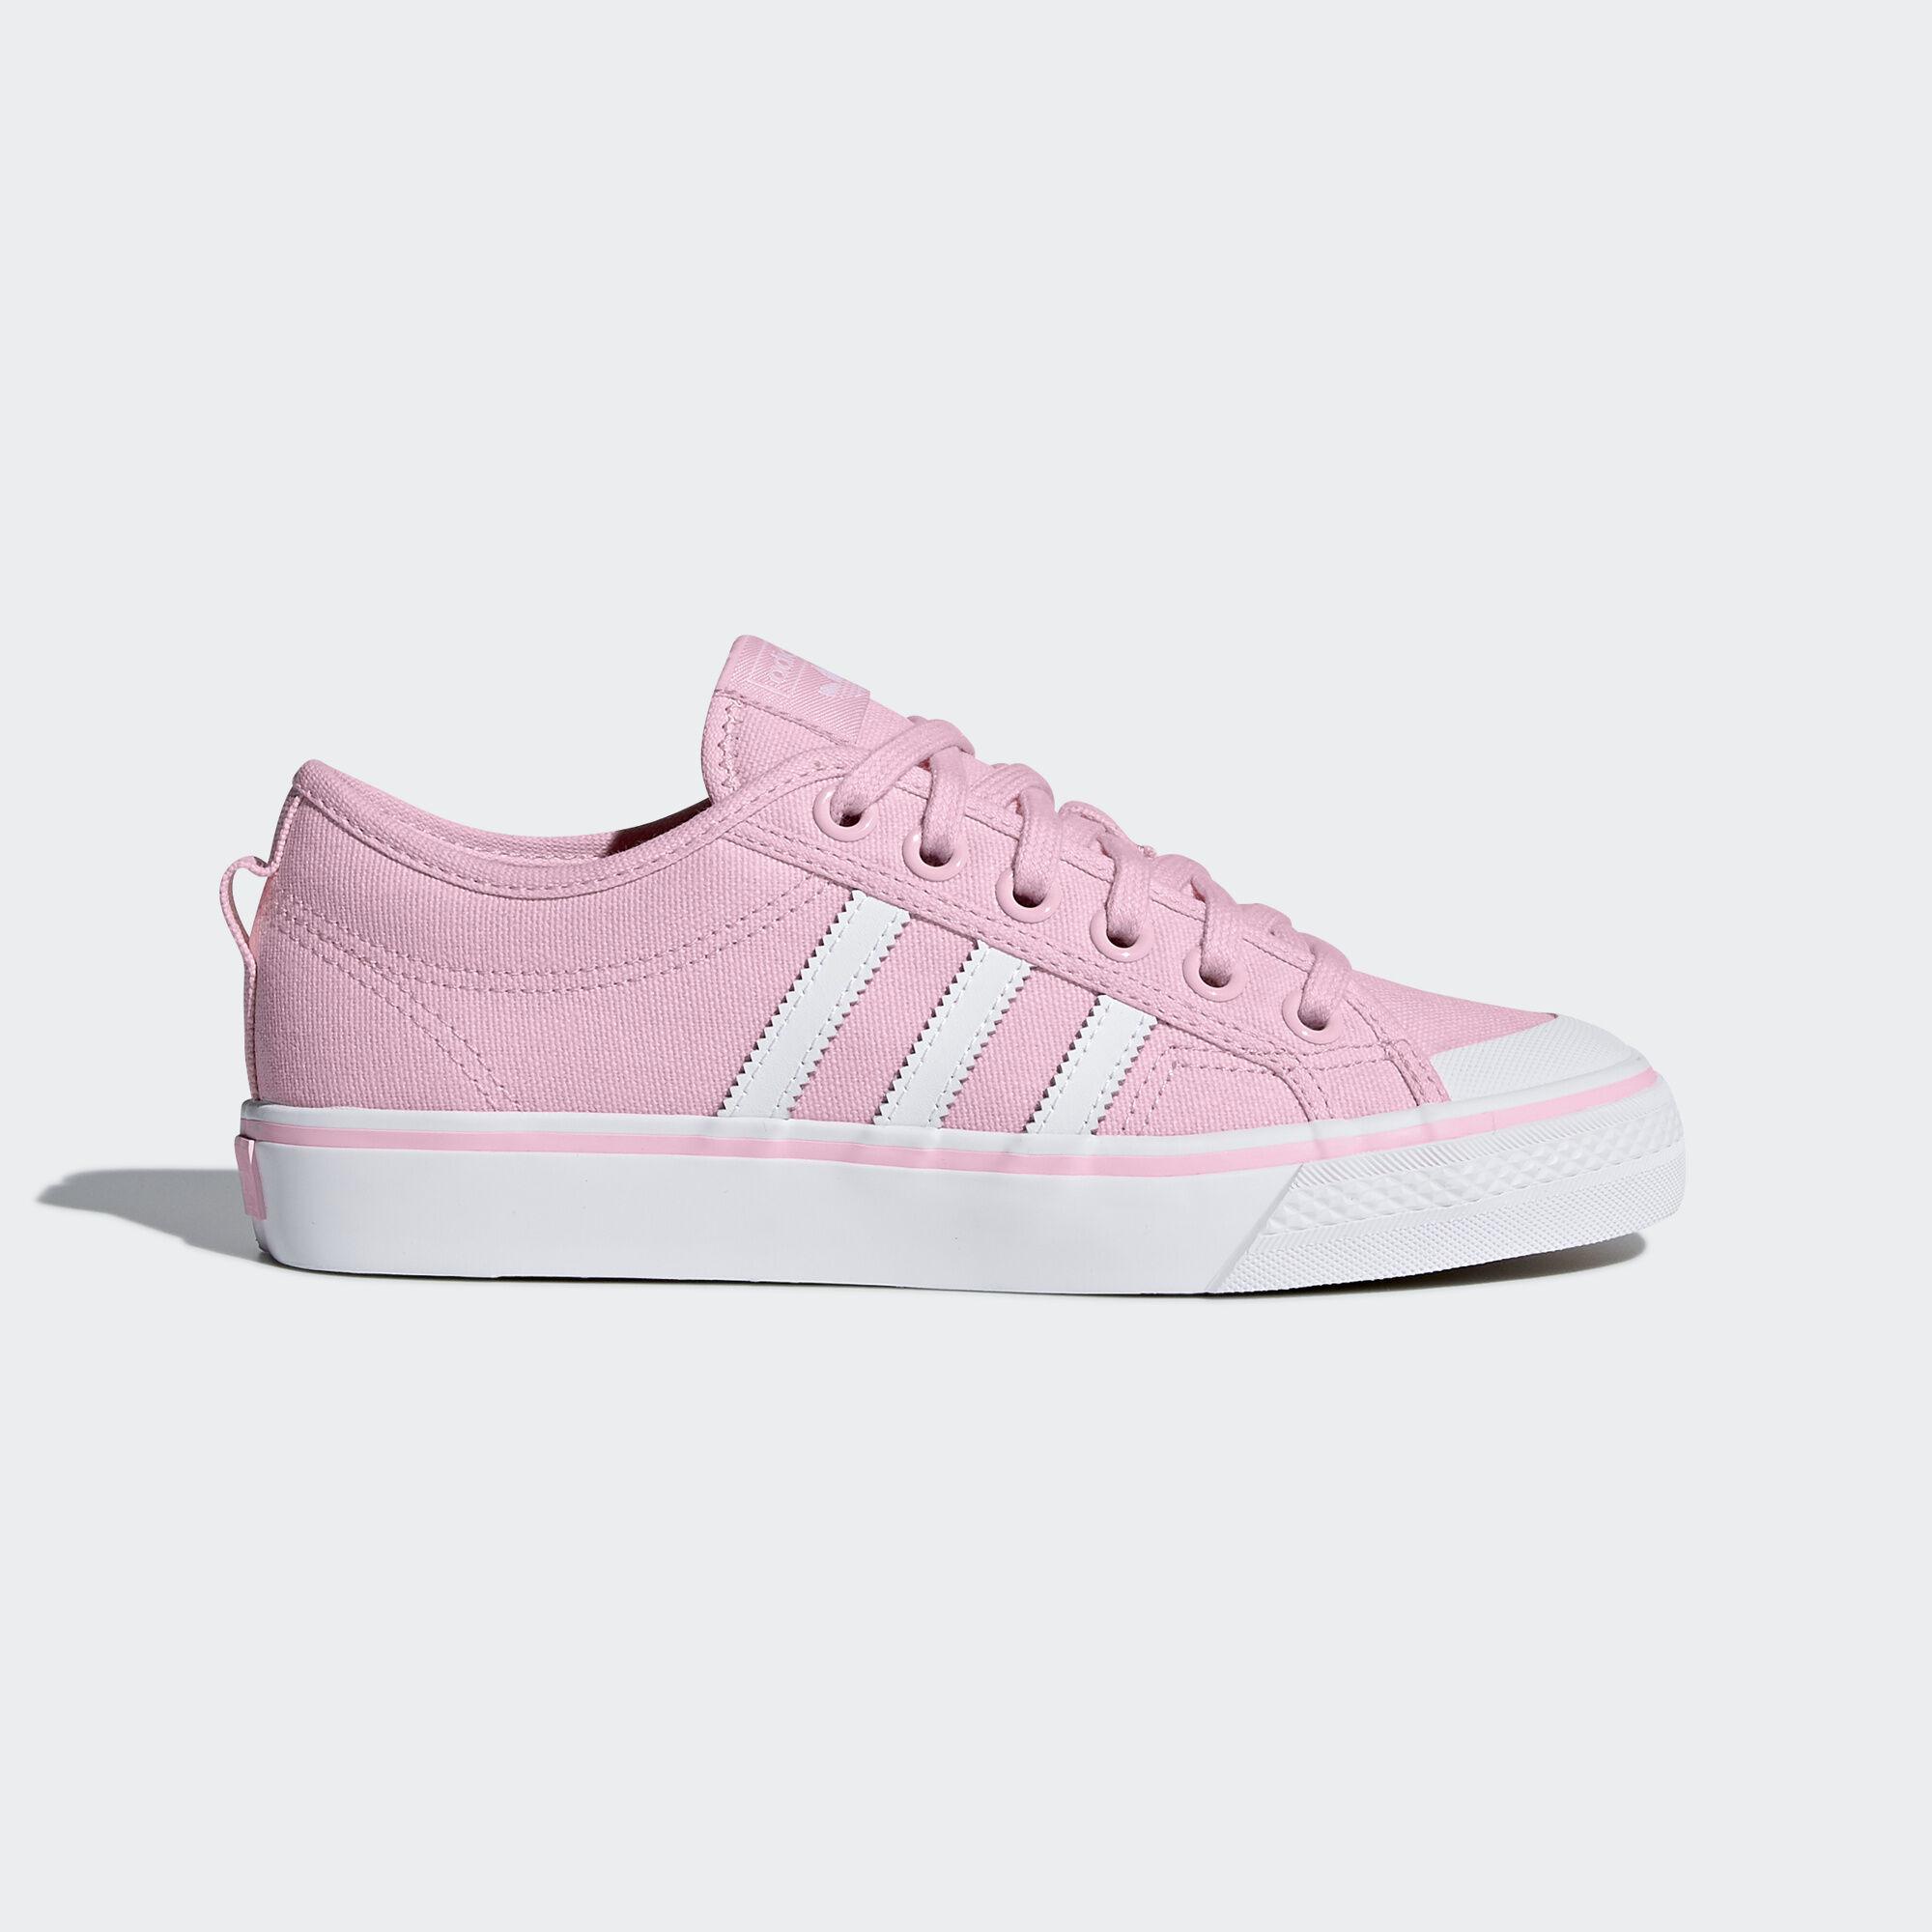 adidas Originals Nizza W Wonder Pink Footwear White Women Casual Shoes CQ2539